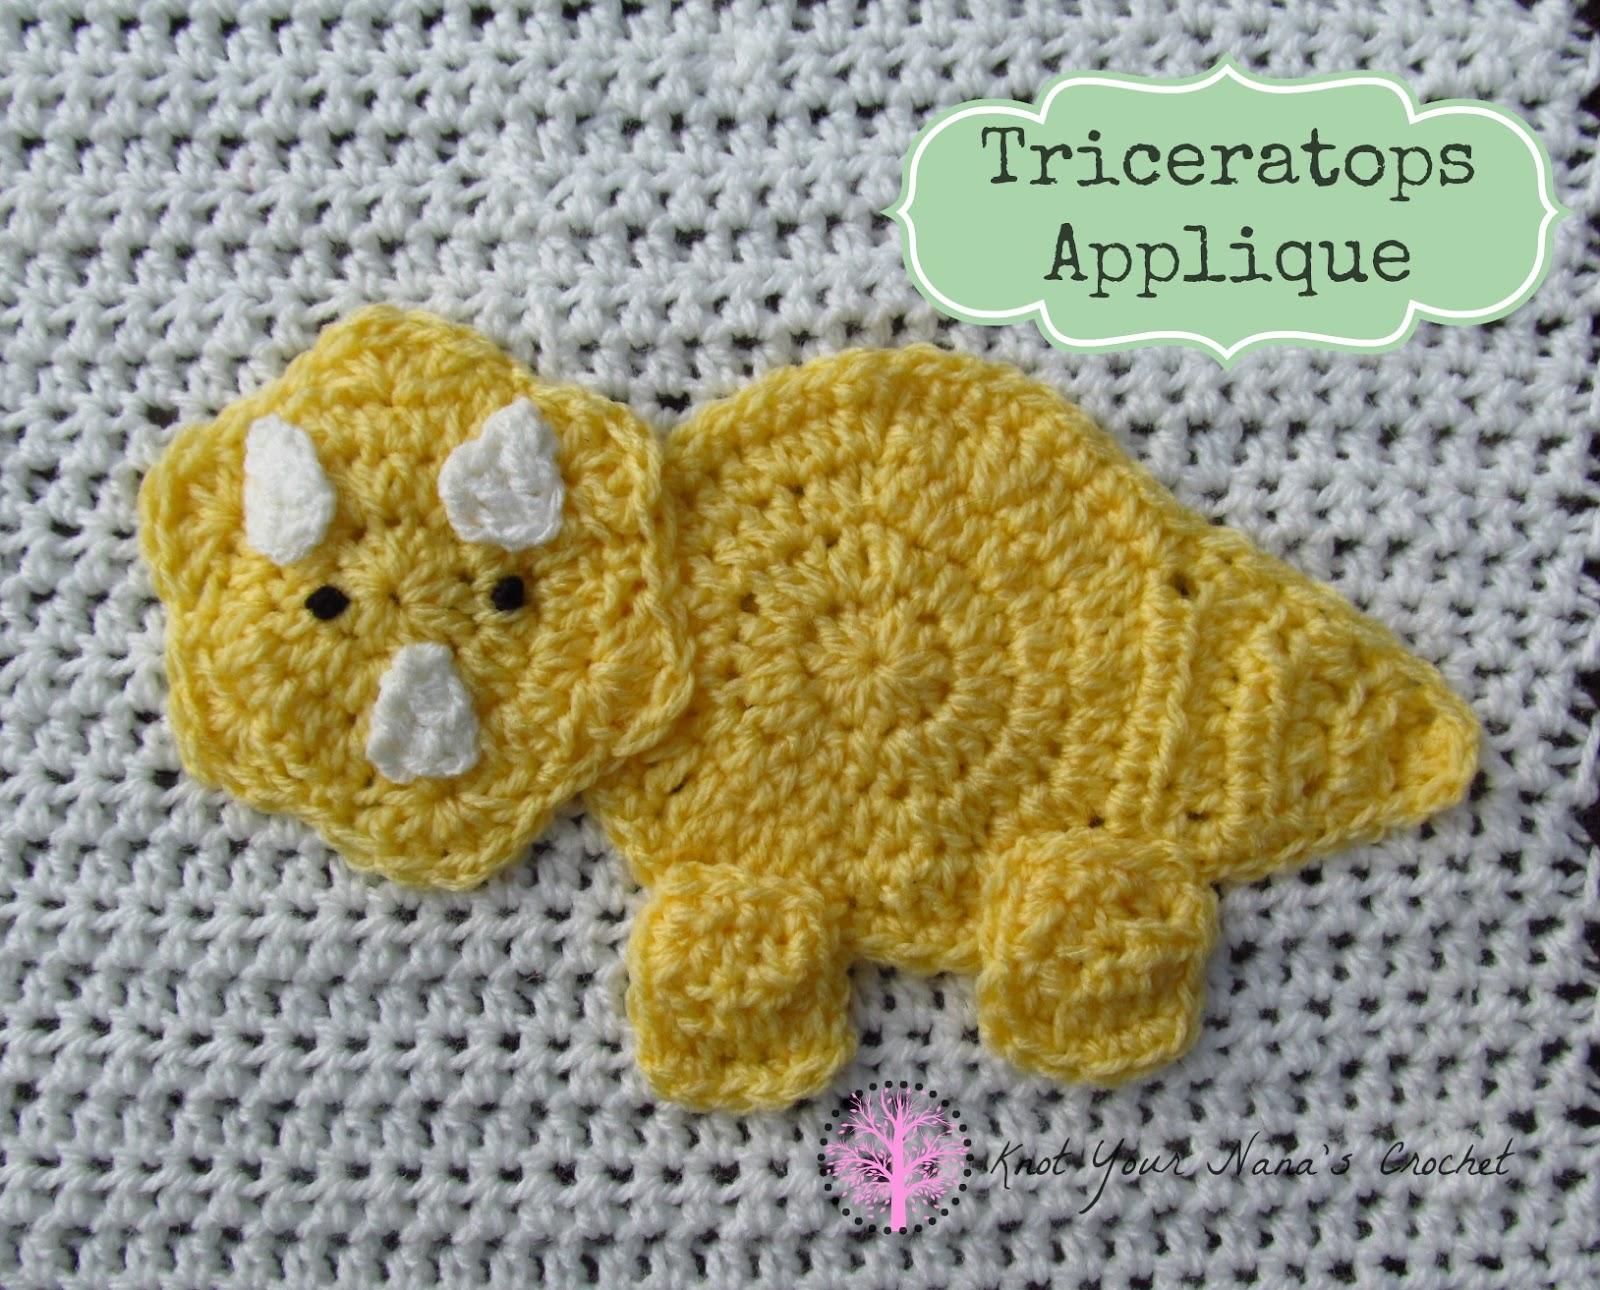 Crochet Dinosaur Afghan Pattern : Knot Your Nanas Crochet: Crochet Dinosaur Blanket